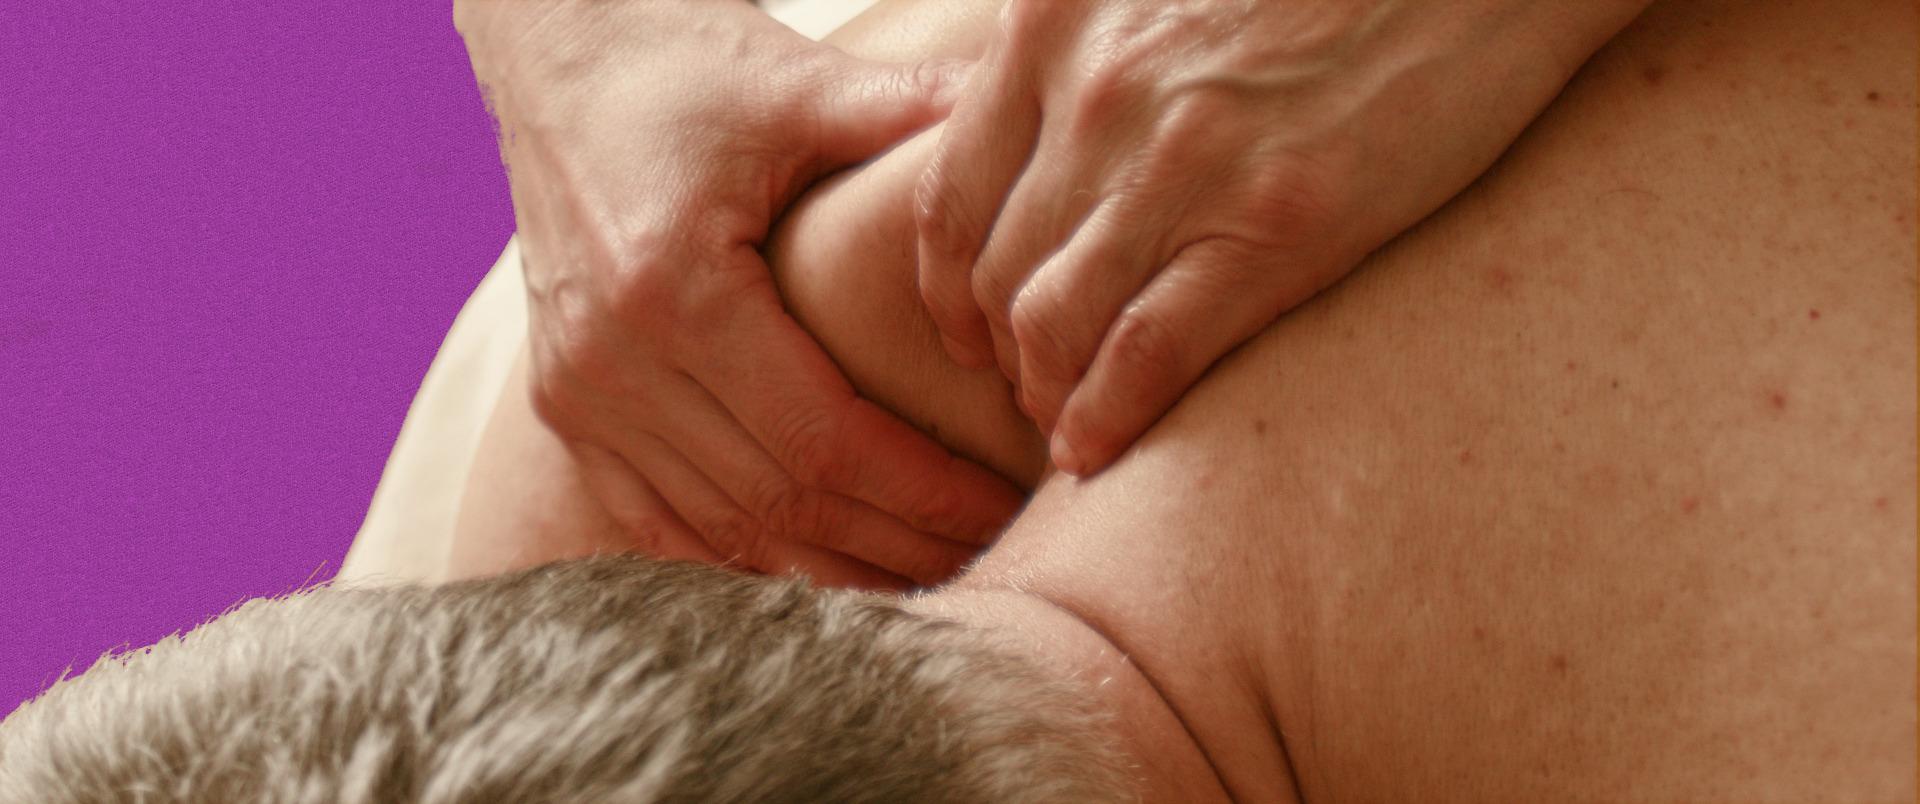 Knoxville deep tissue massage